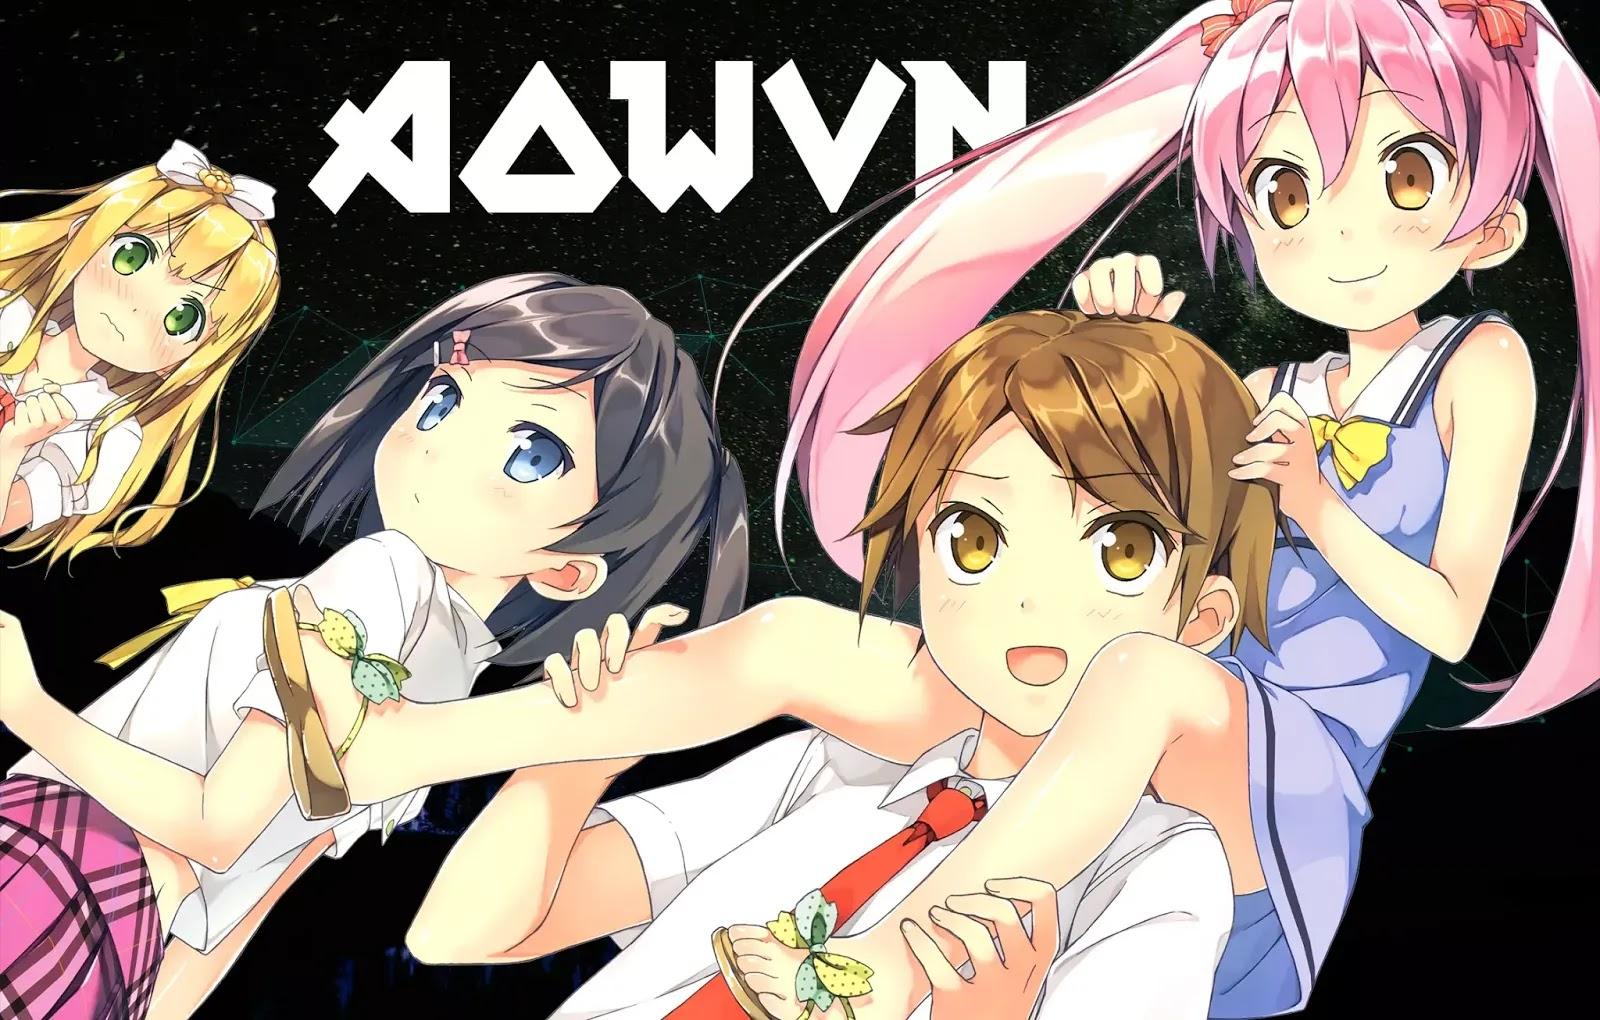 AowVN.org min%2B%25284%2529 - [ Anime 3gp Mp4 ] Hentai Ouji To Warawanai Neko BD | Vietsub - Harem Hay